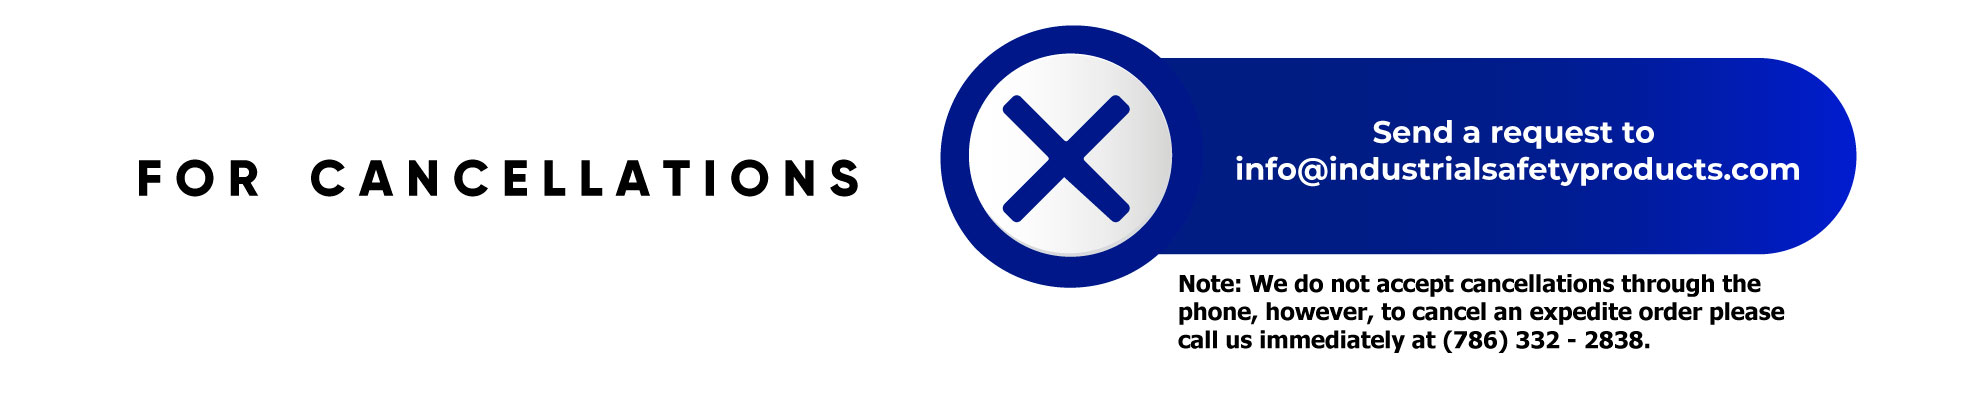 returns-exchange-cancellations-04-.jpg